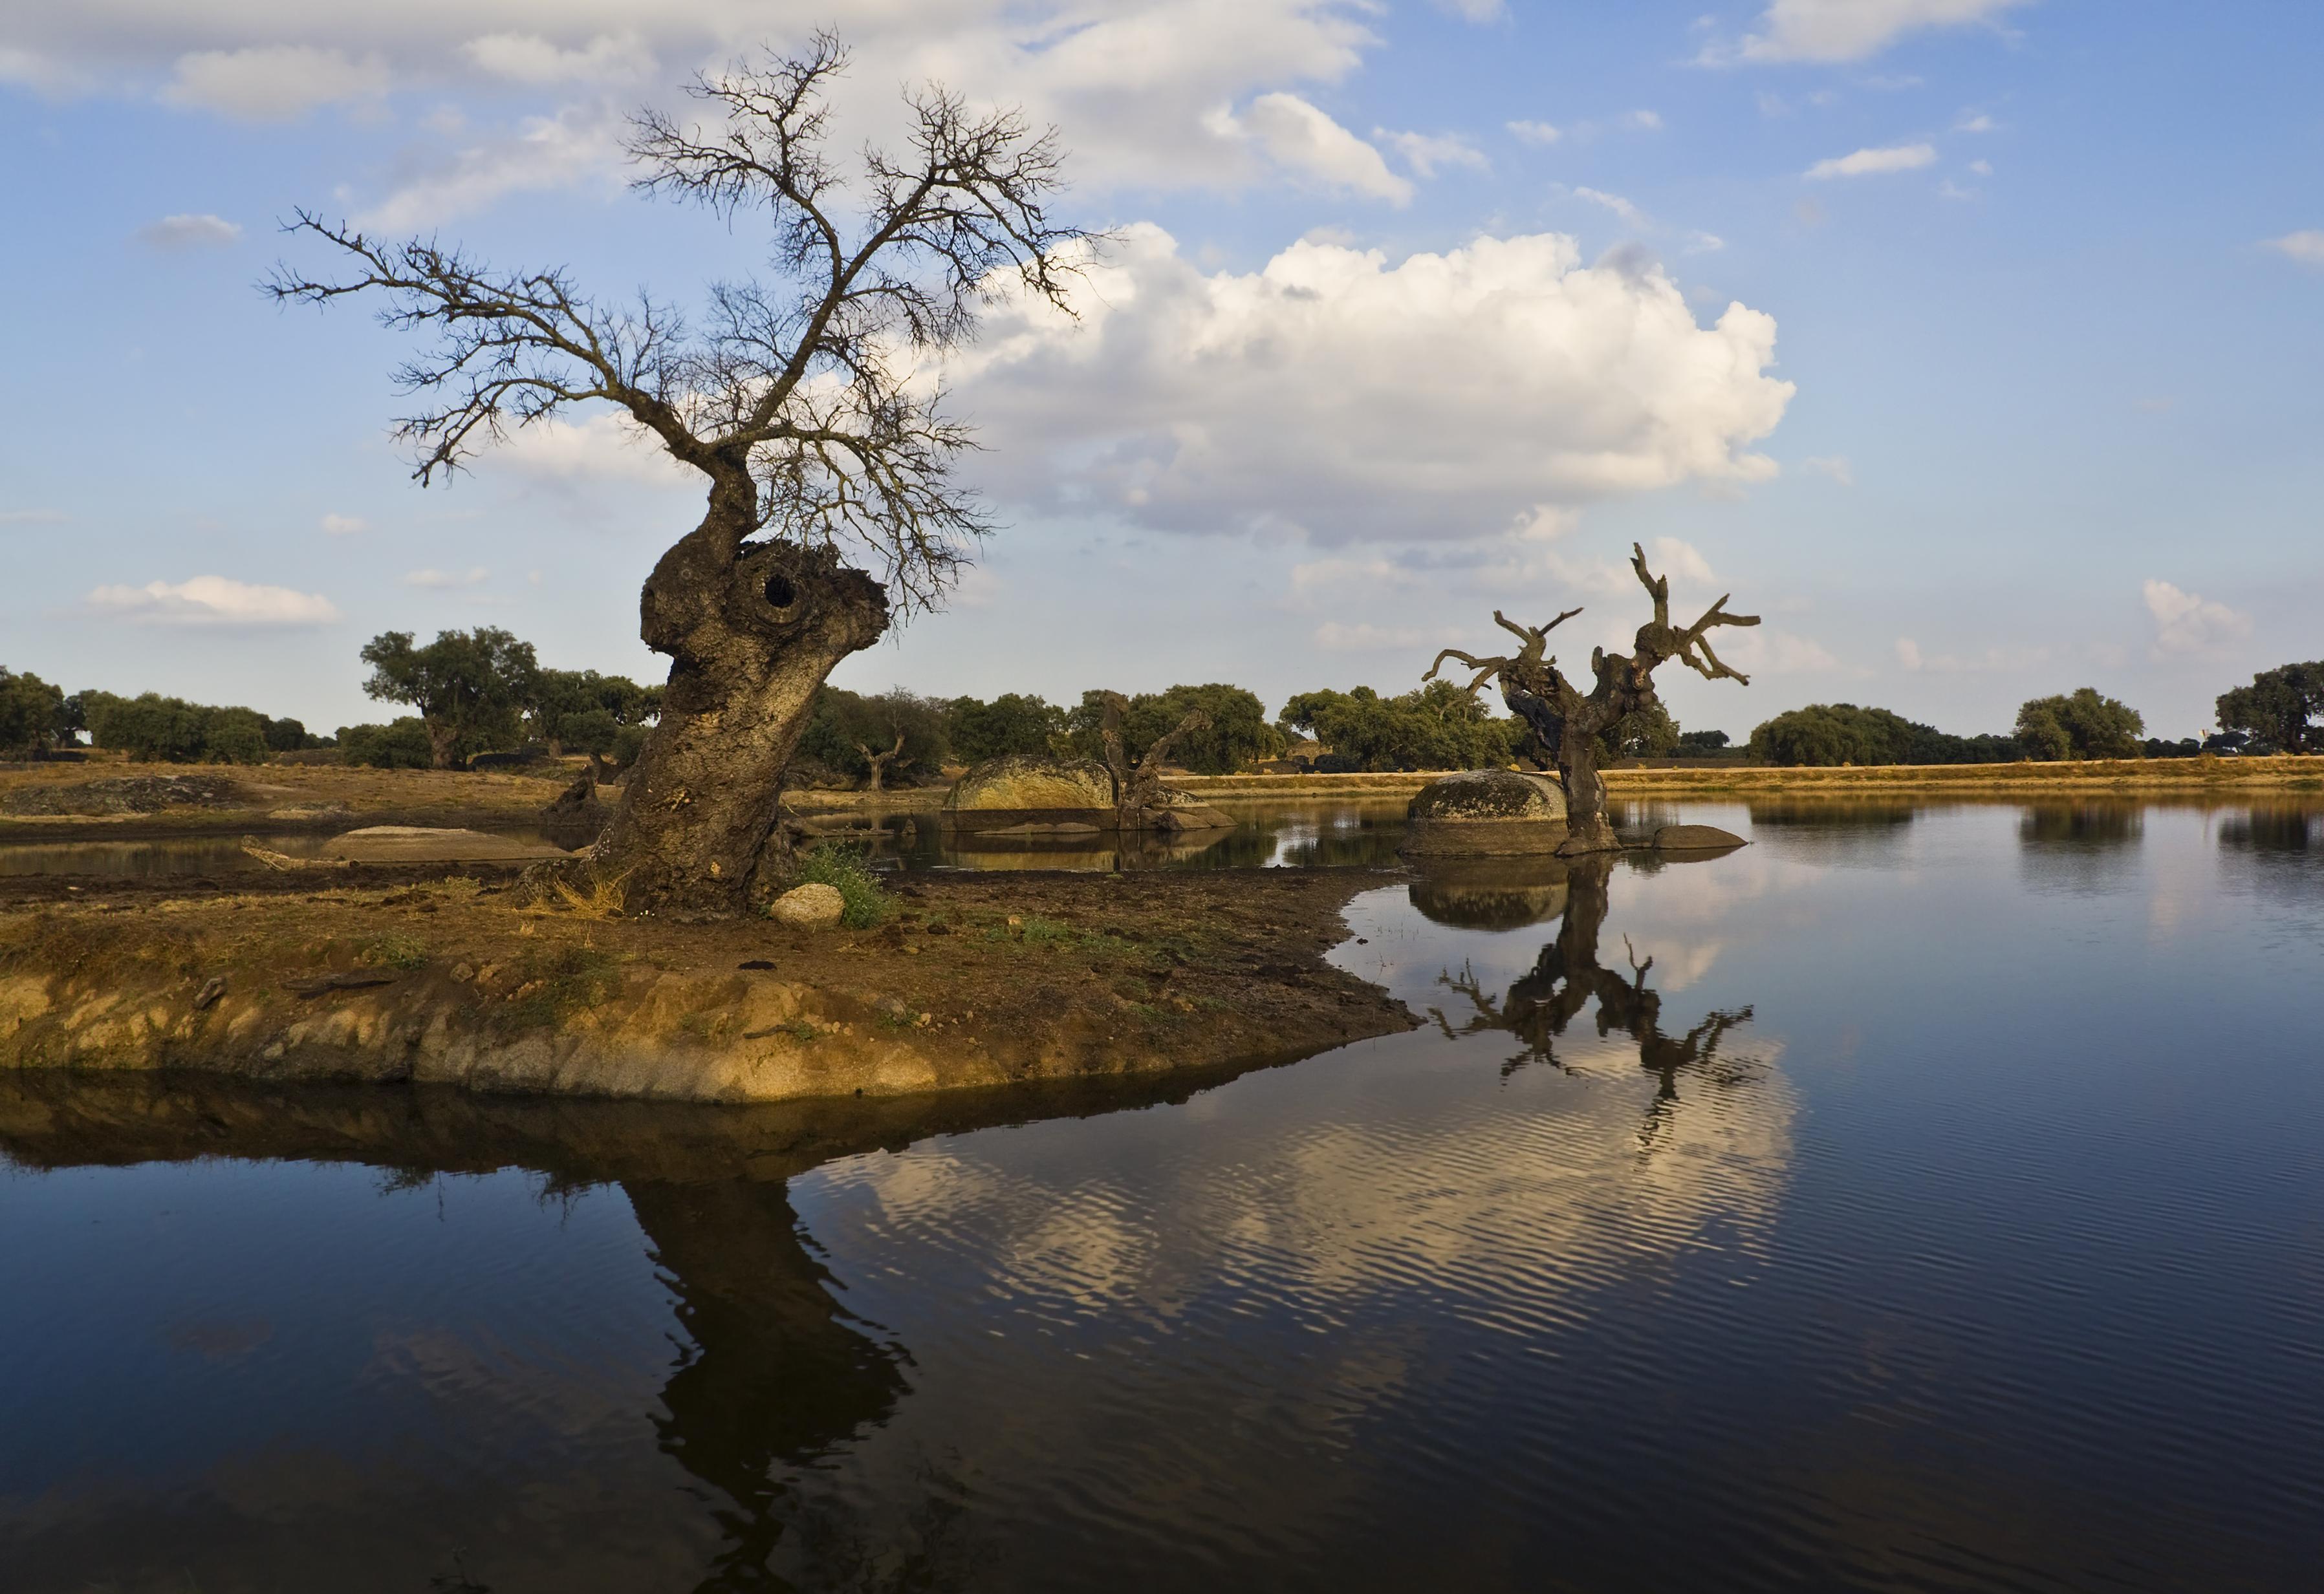 Wallpaper Landscape Photoshop Lake Nature Reflection